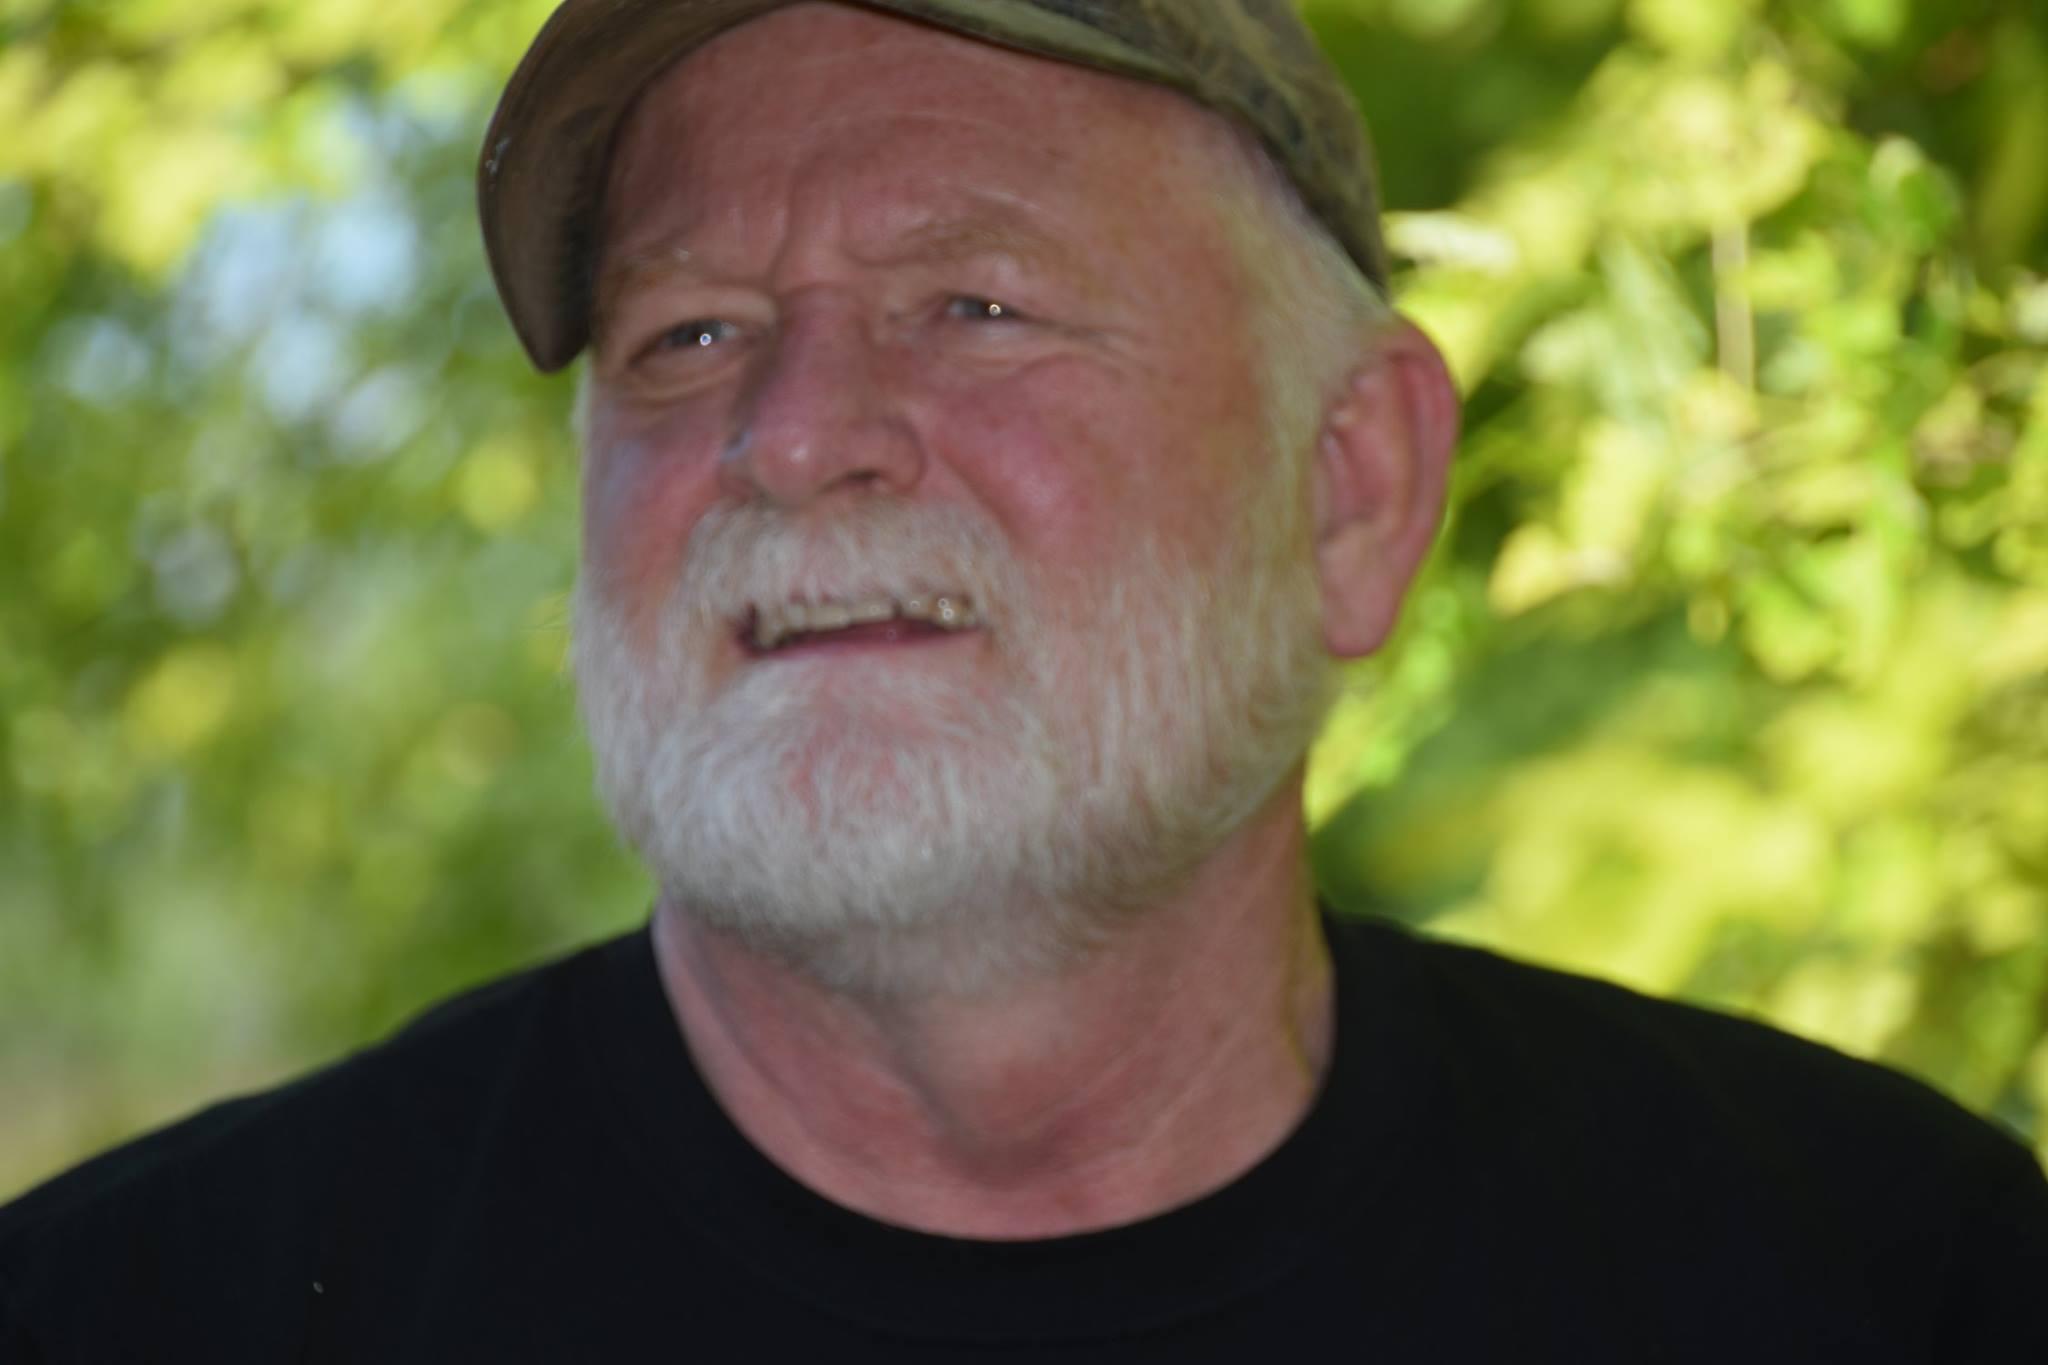 Author Brent Olson